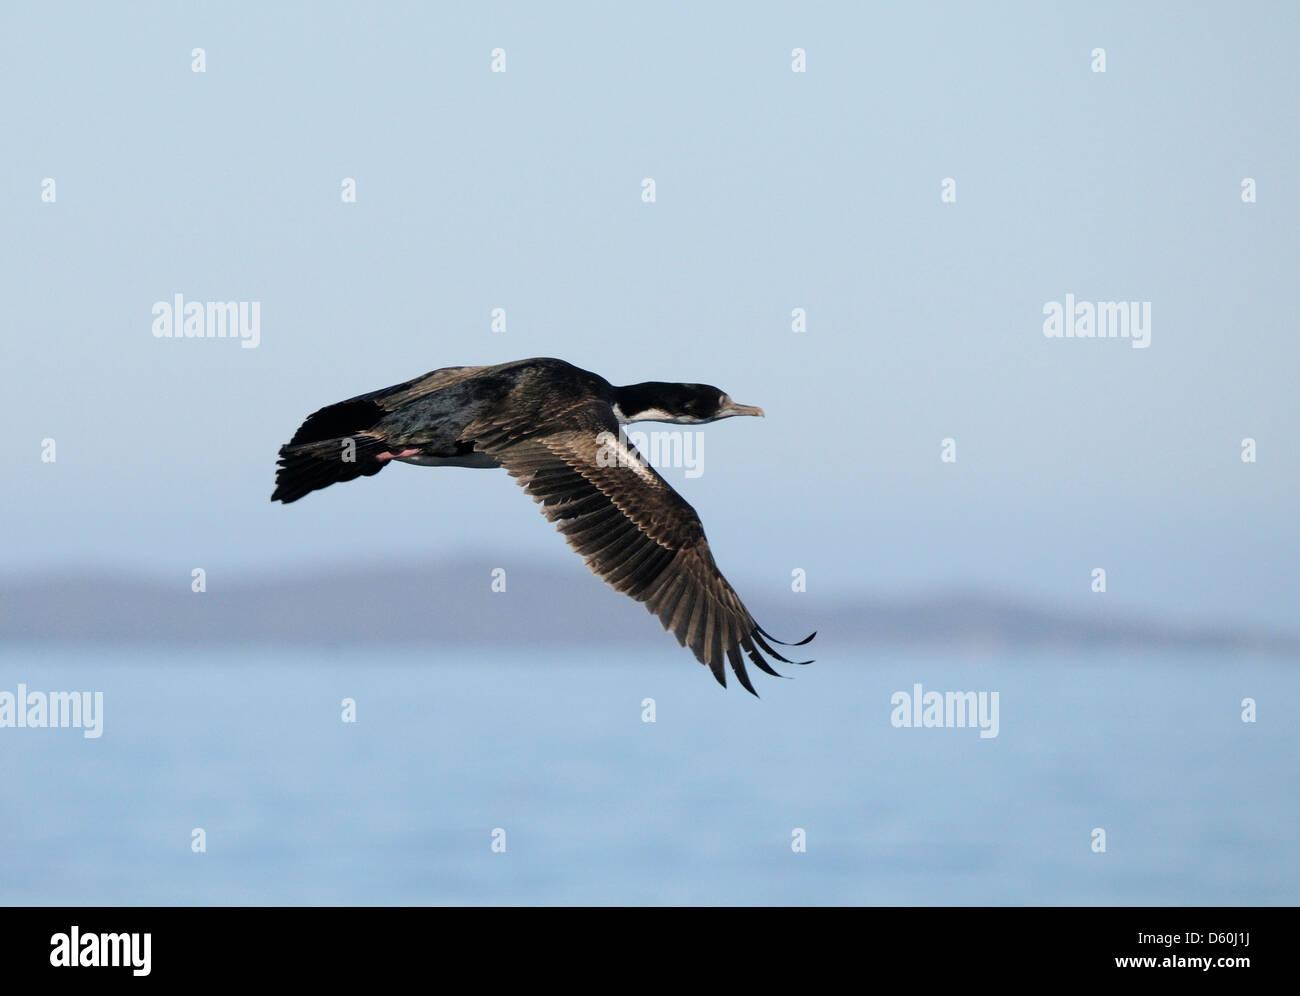 Imperial Shag (Phalacrocorax atriceps) in flight.  Cape Horn National Park. Cabo de Hornos, Isla Hornos. Republic - Stock Image